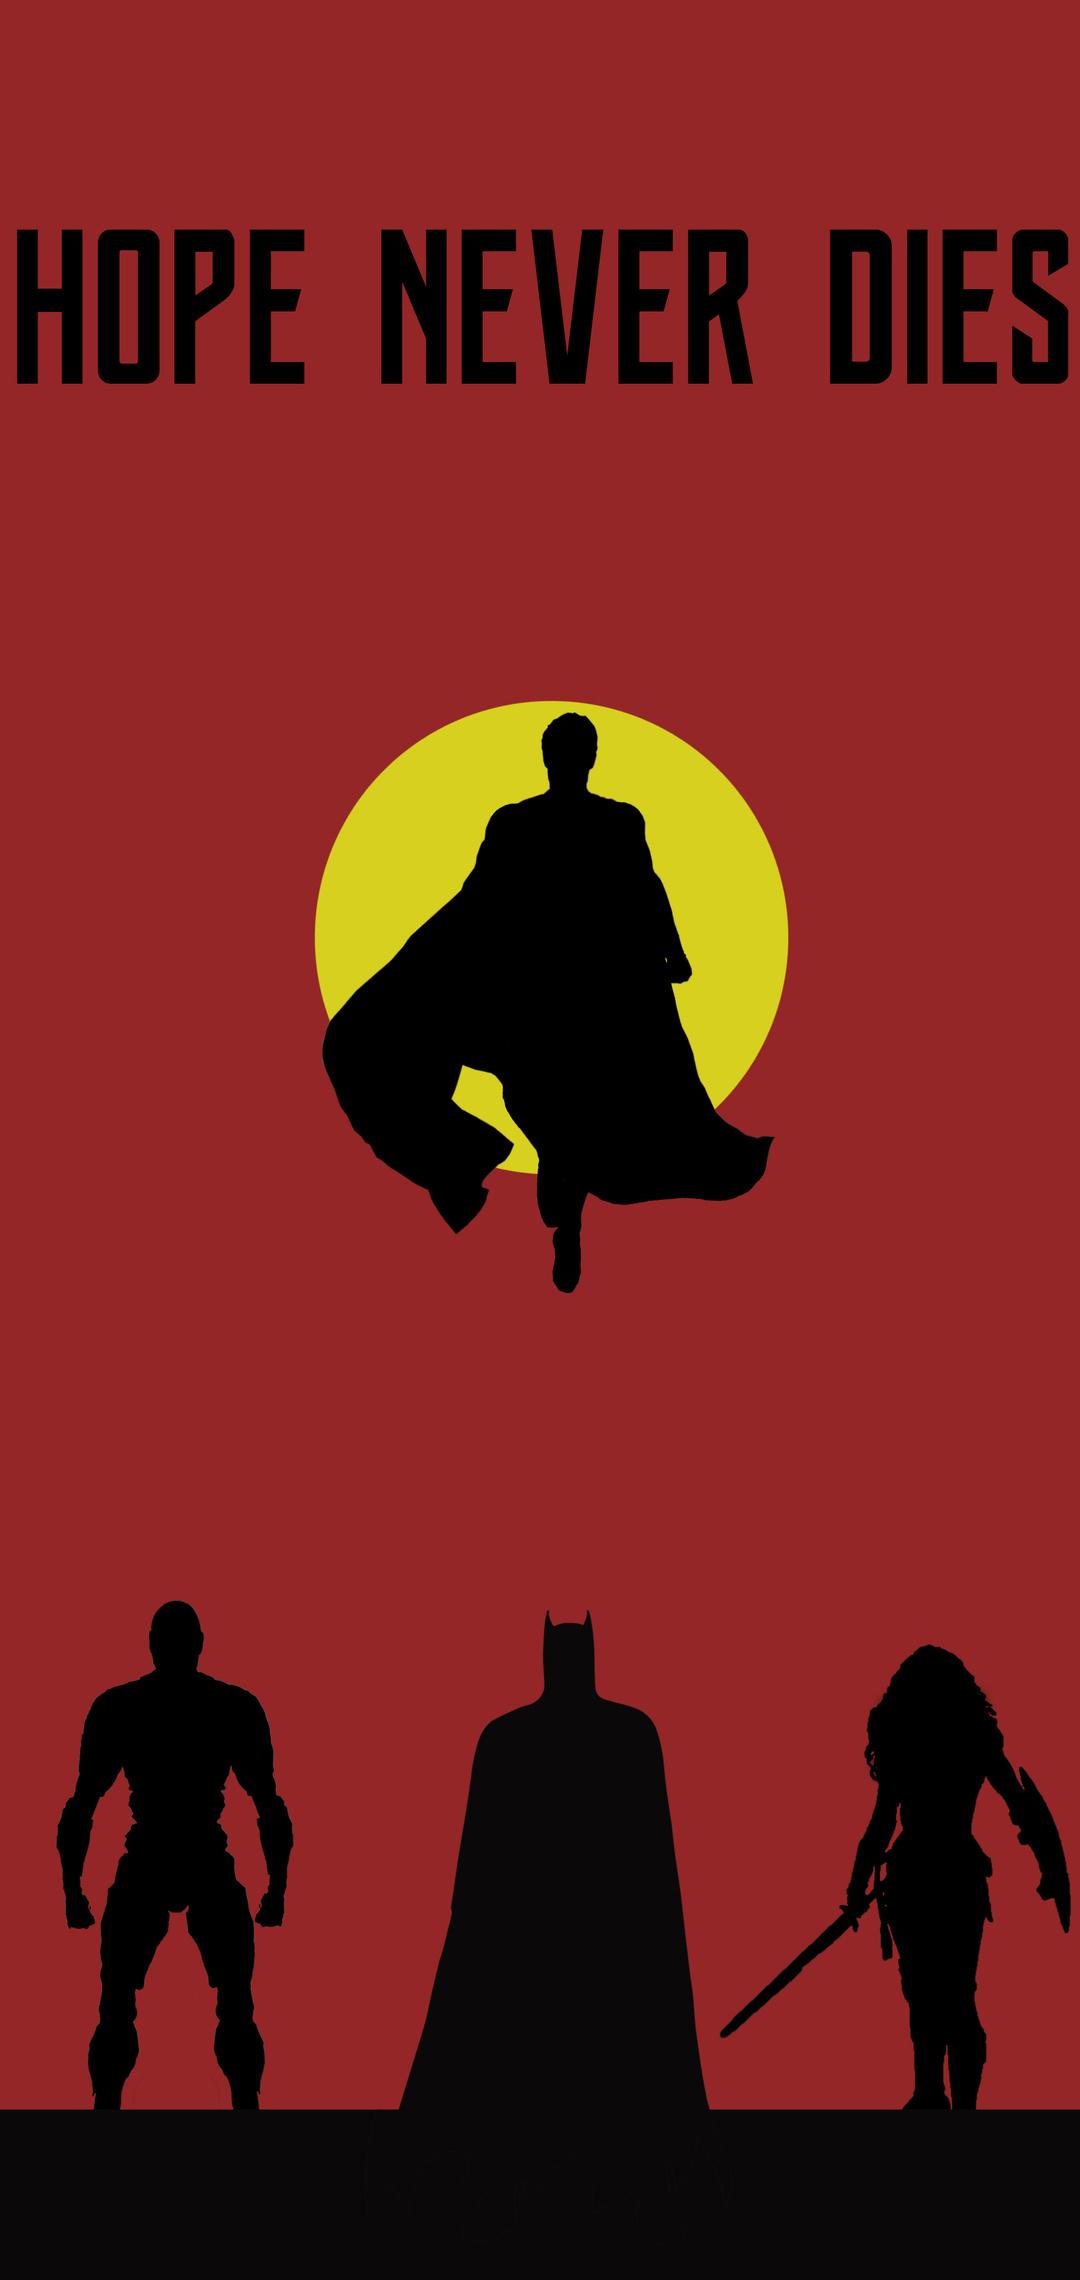 justice-league-hope-never-dies-o1.jpg